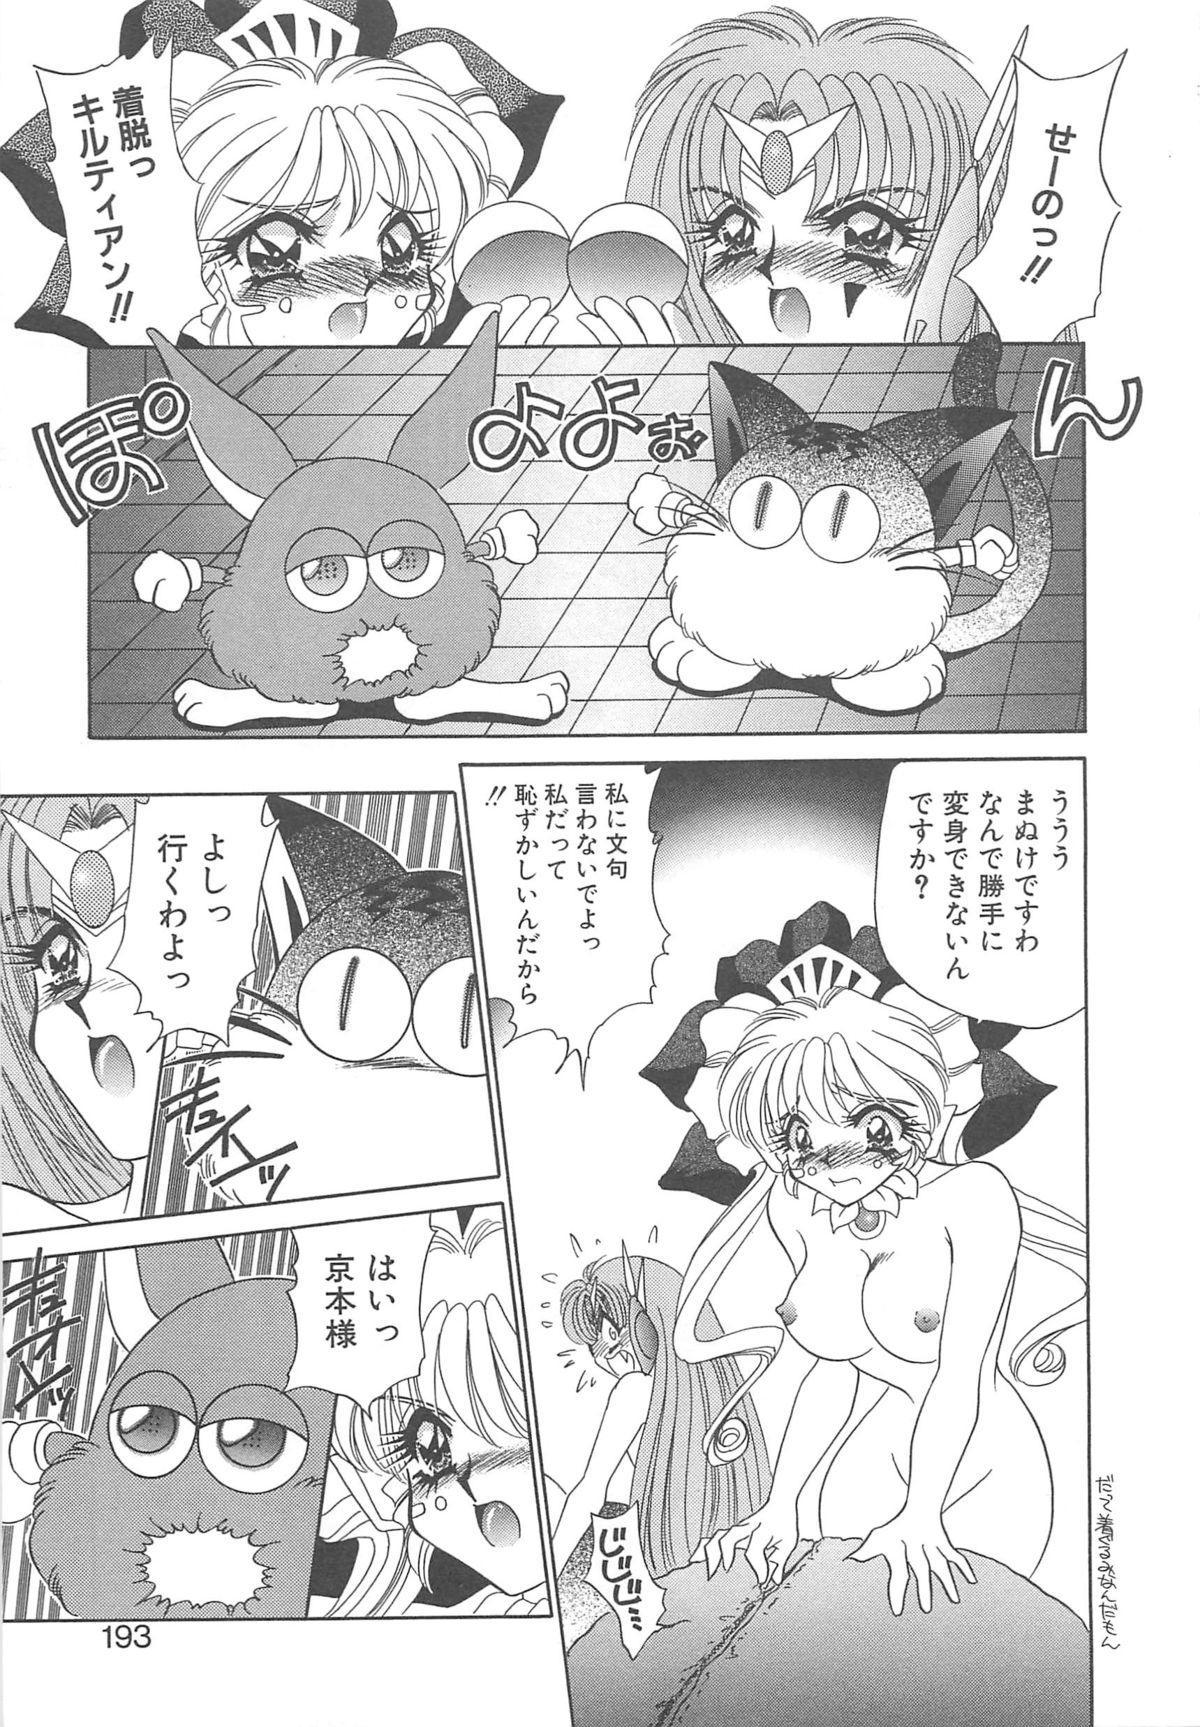 Kigurumi Sentai Quiltian 191